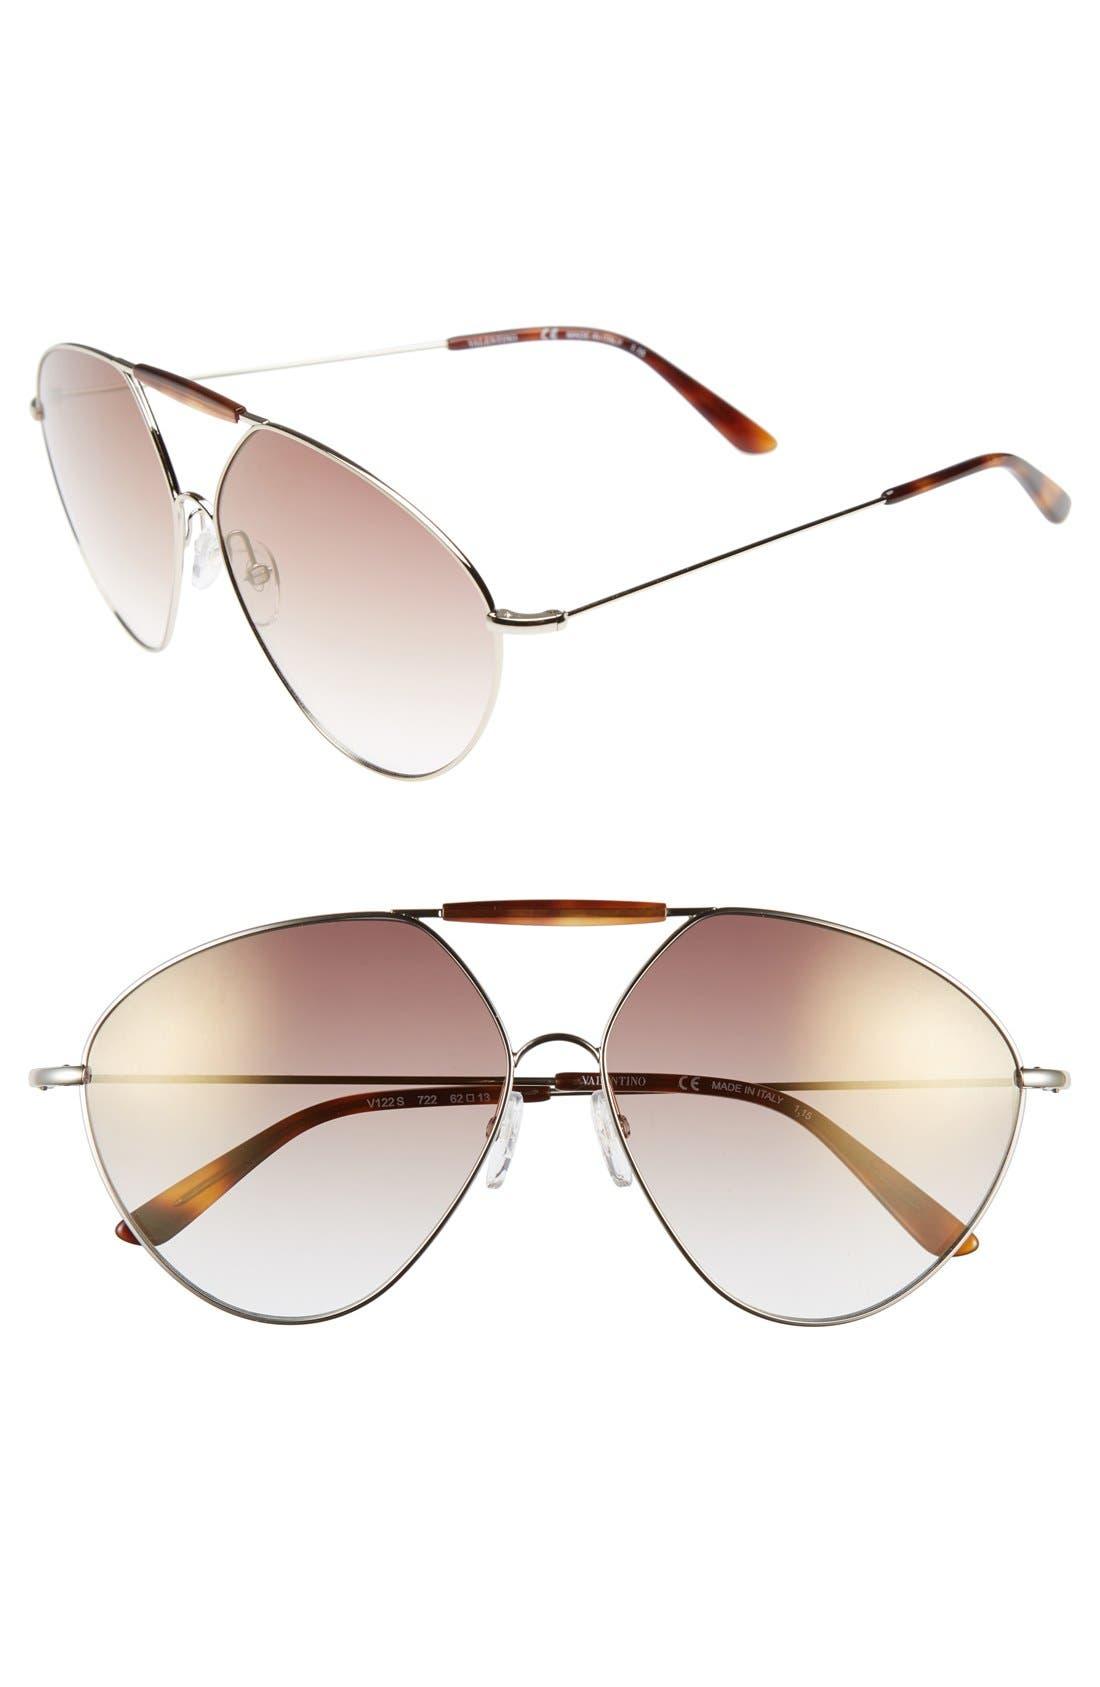 Alternate Image 1 Selected - Valentino 'Runway' 62mm Aviator Sunglasses